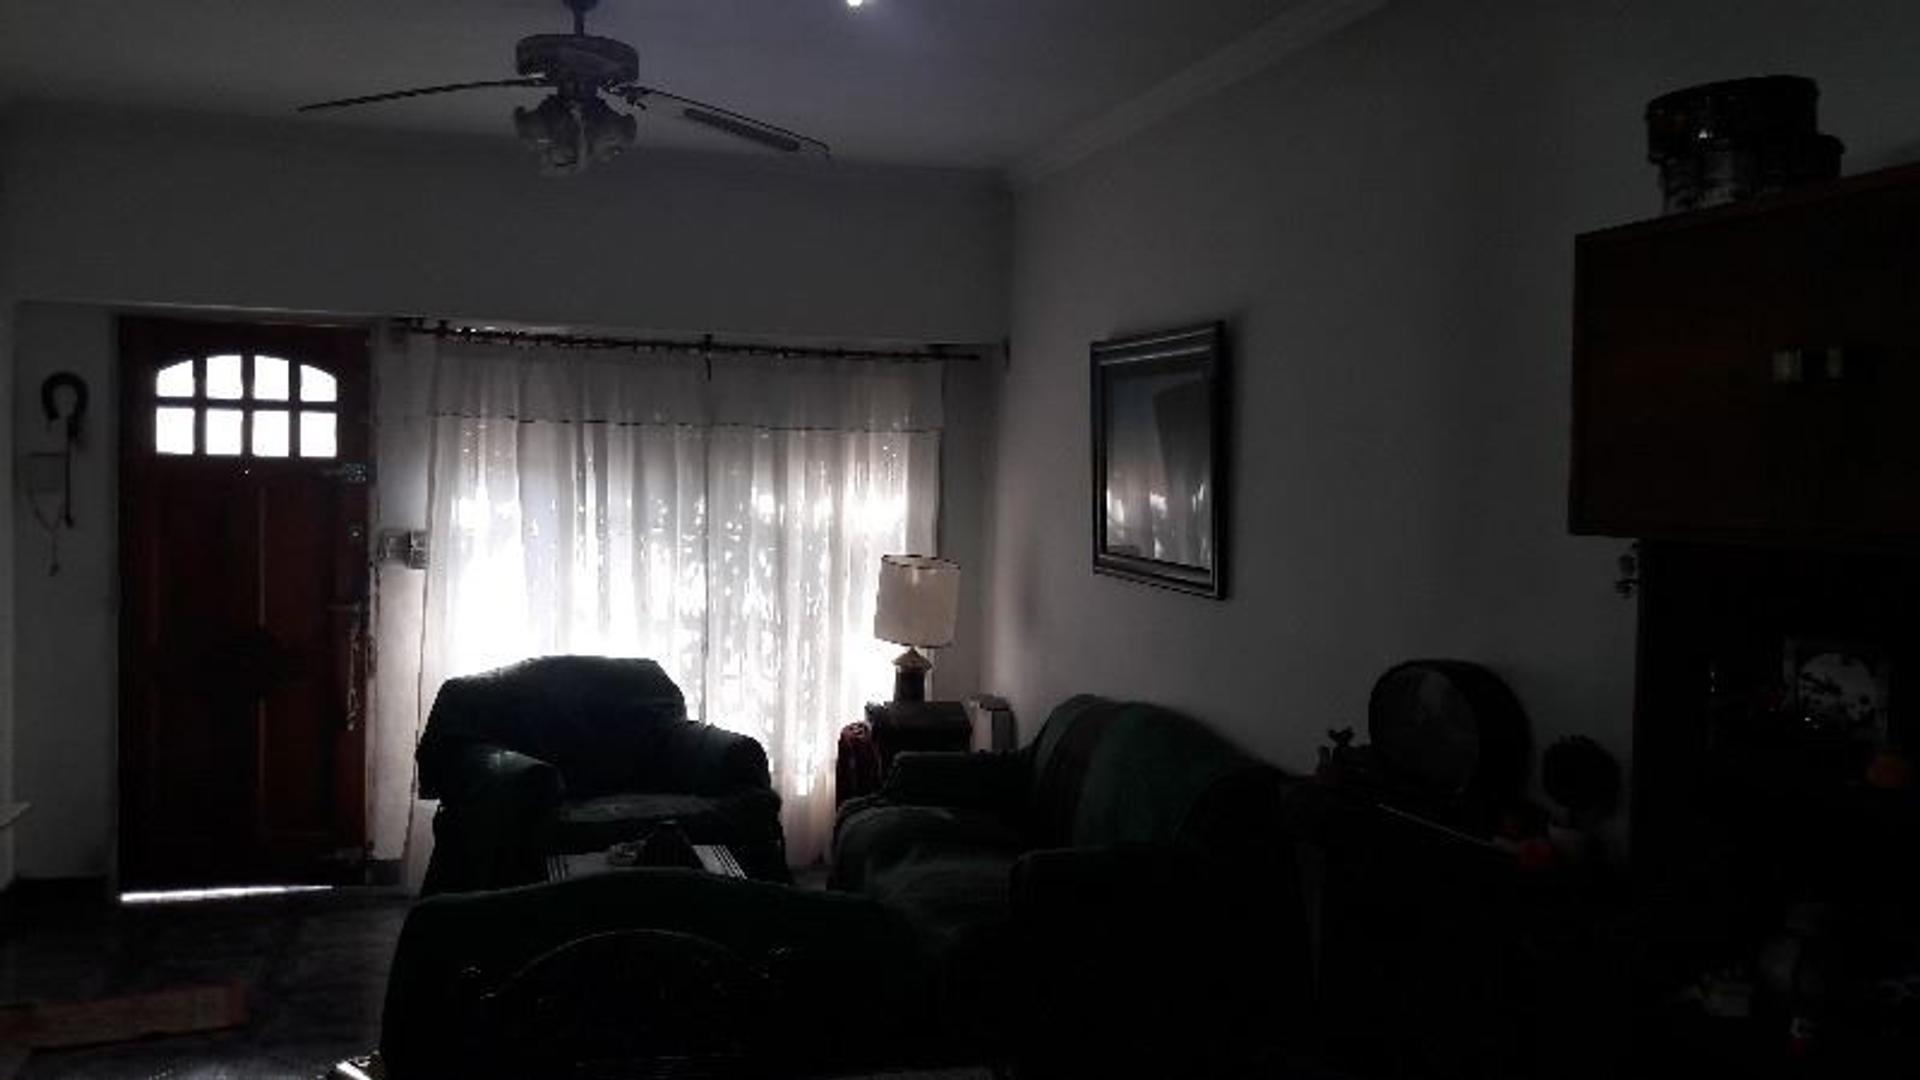 CASA PARA DOS FAMILIAS EN DOS PLANTAS - APTO CRÉDITO - EN VILLA SARMIENTO - MORON